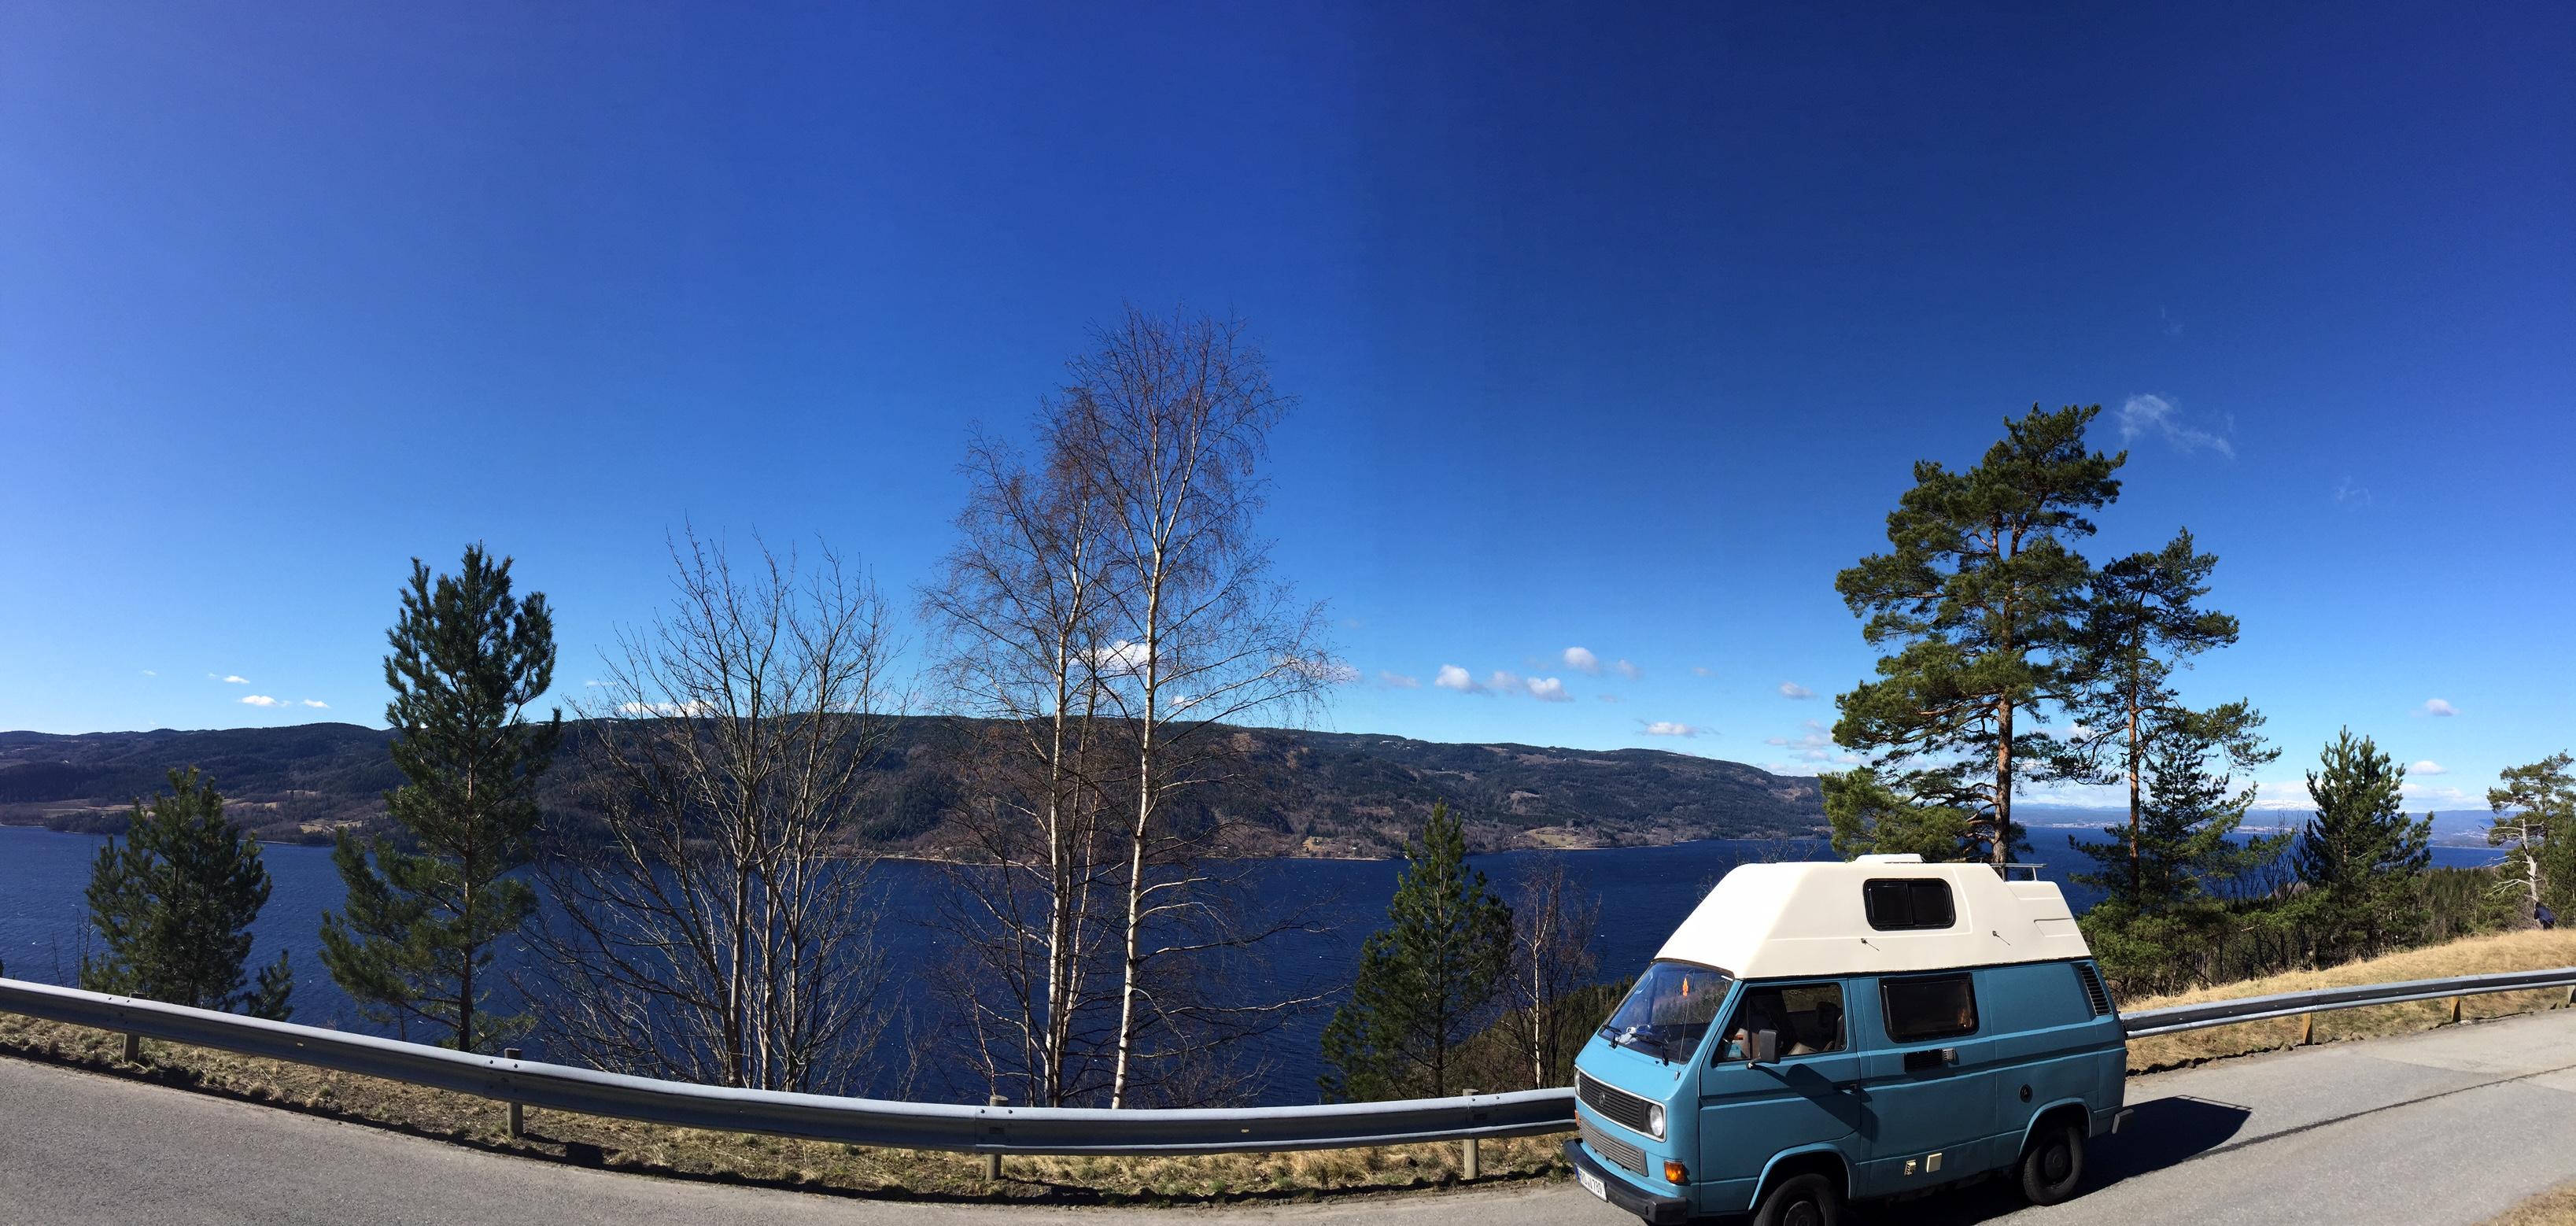 VW-T3-camper-mieten-rostock-urlaub-ostsee-schweden-norwegen-betti5